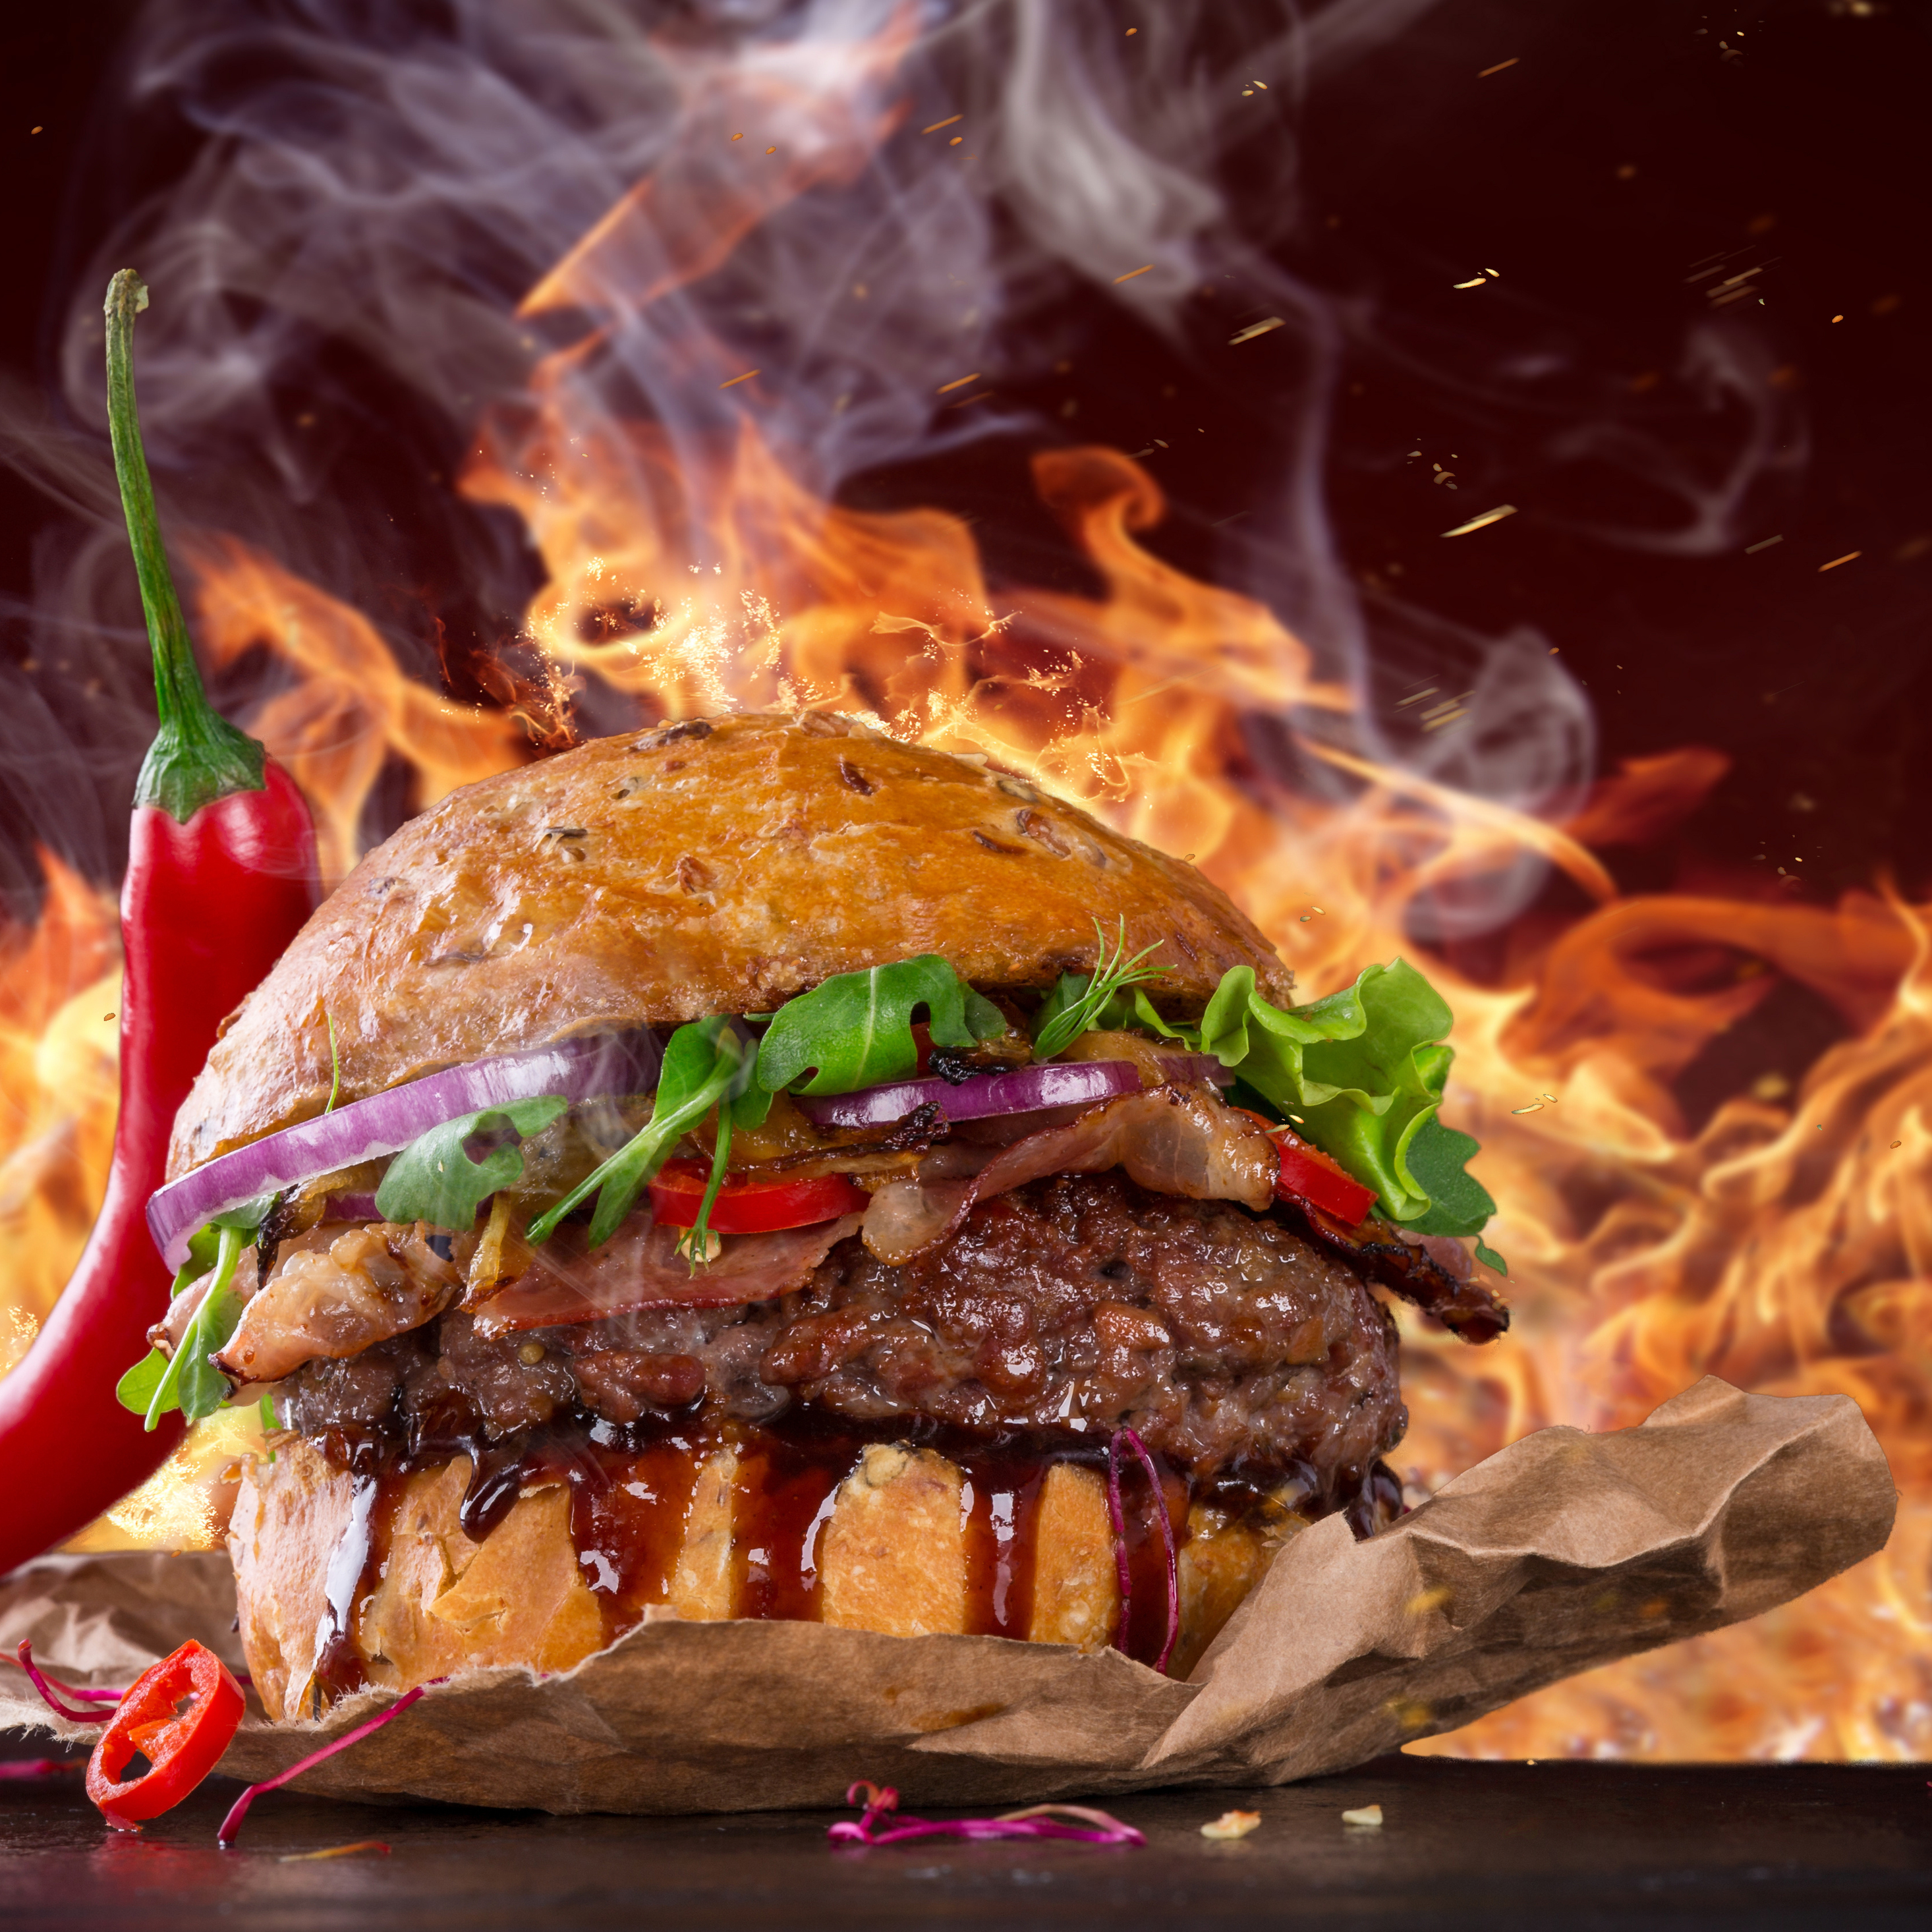 2932x2932 Hot Spicy Burger Ipad Pro Retina Display HD 4k